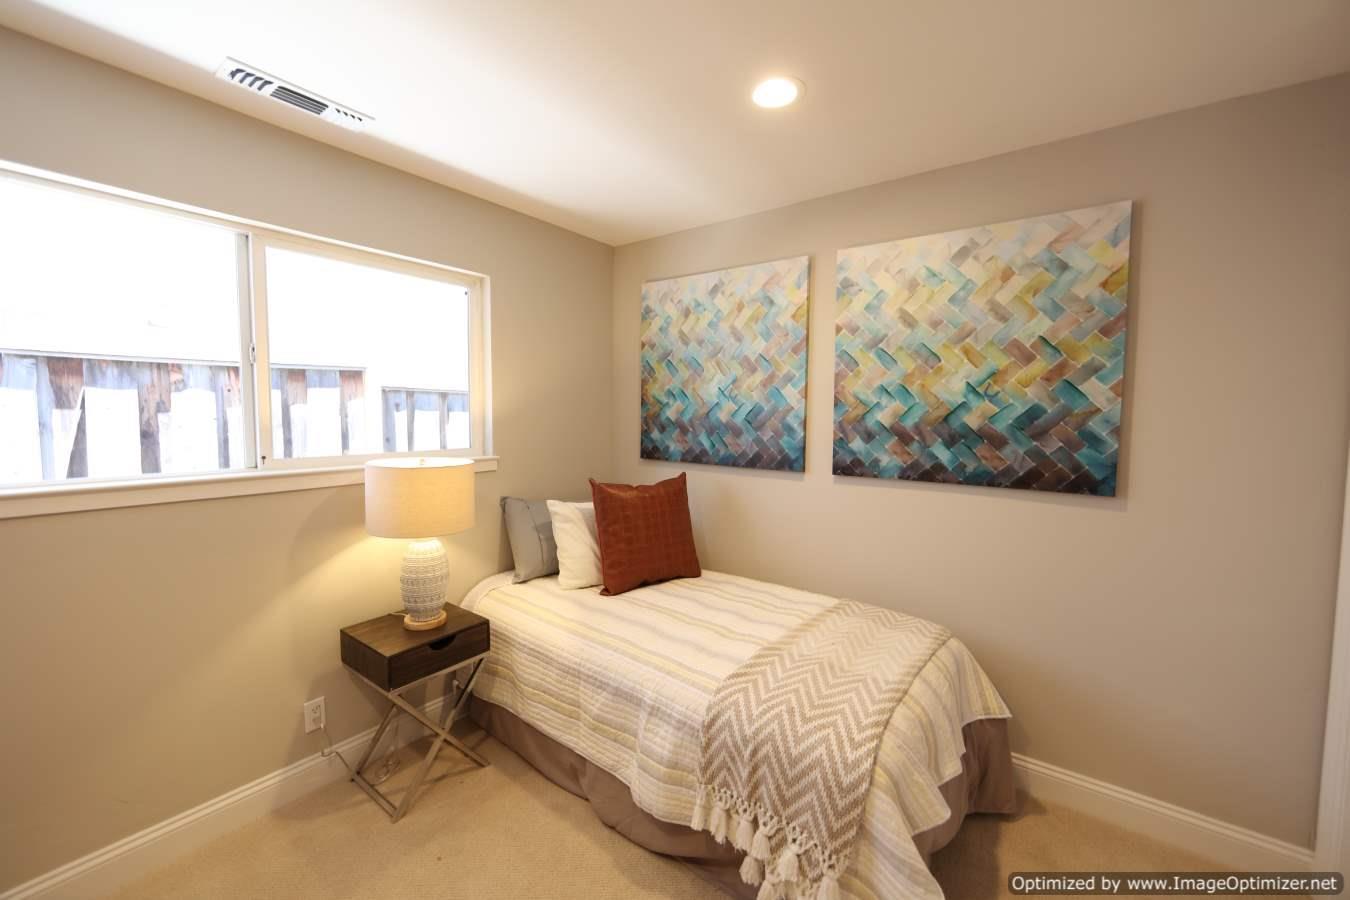 Additional photo for property listing at 4113 Ashbrook Circle  San Jose, California 95124 Estados Unidos